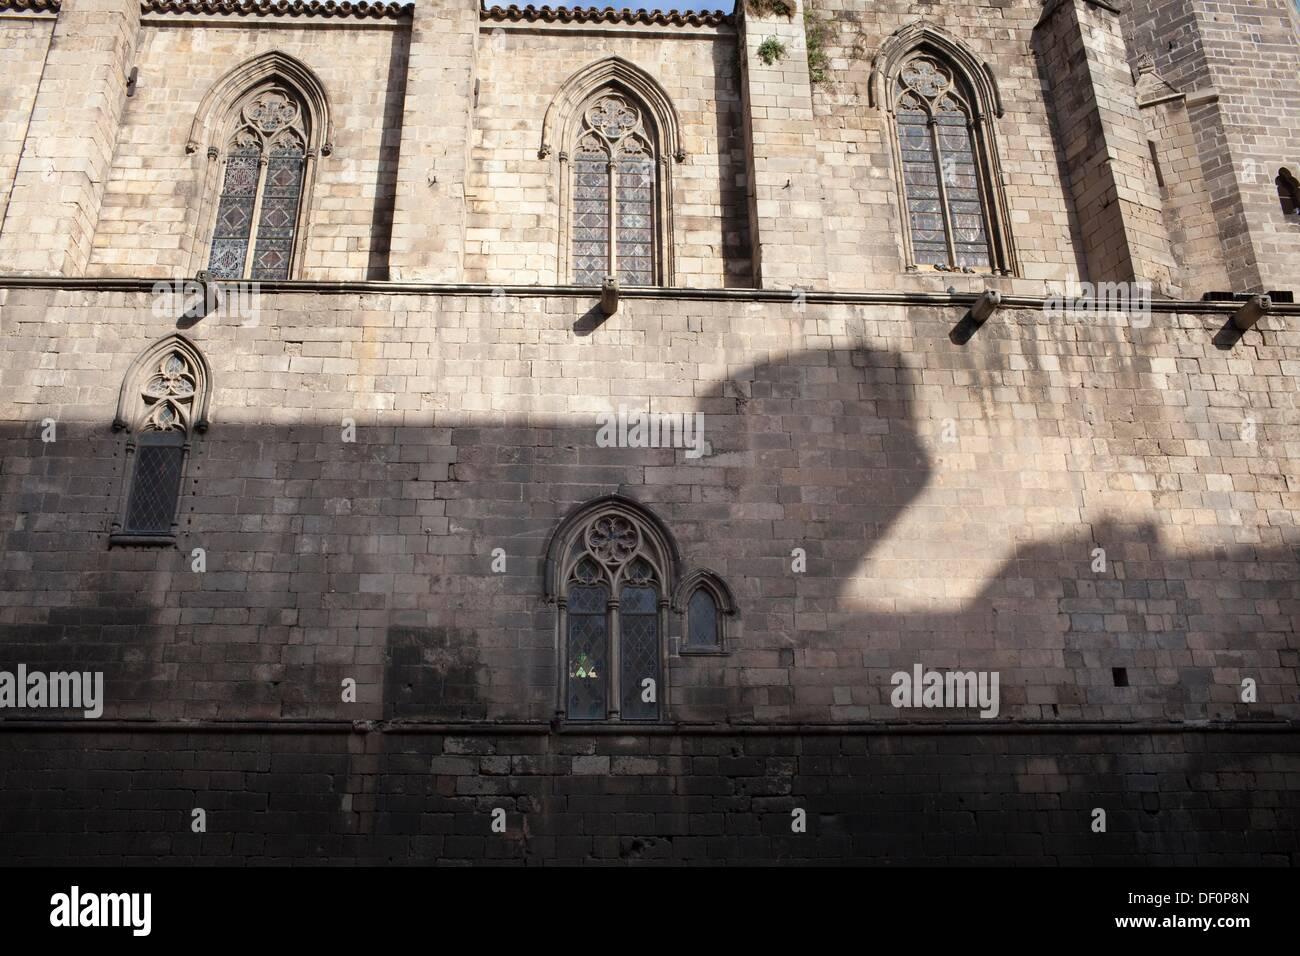 Plaça del Rei, Barcelona, Catalonia, Spain - Stock Image